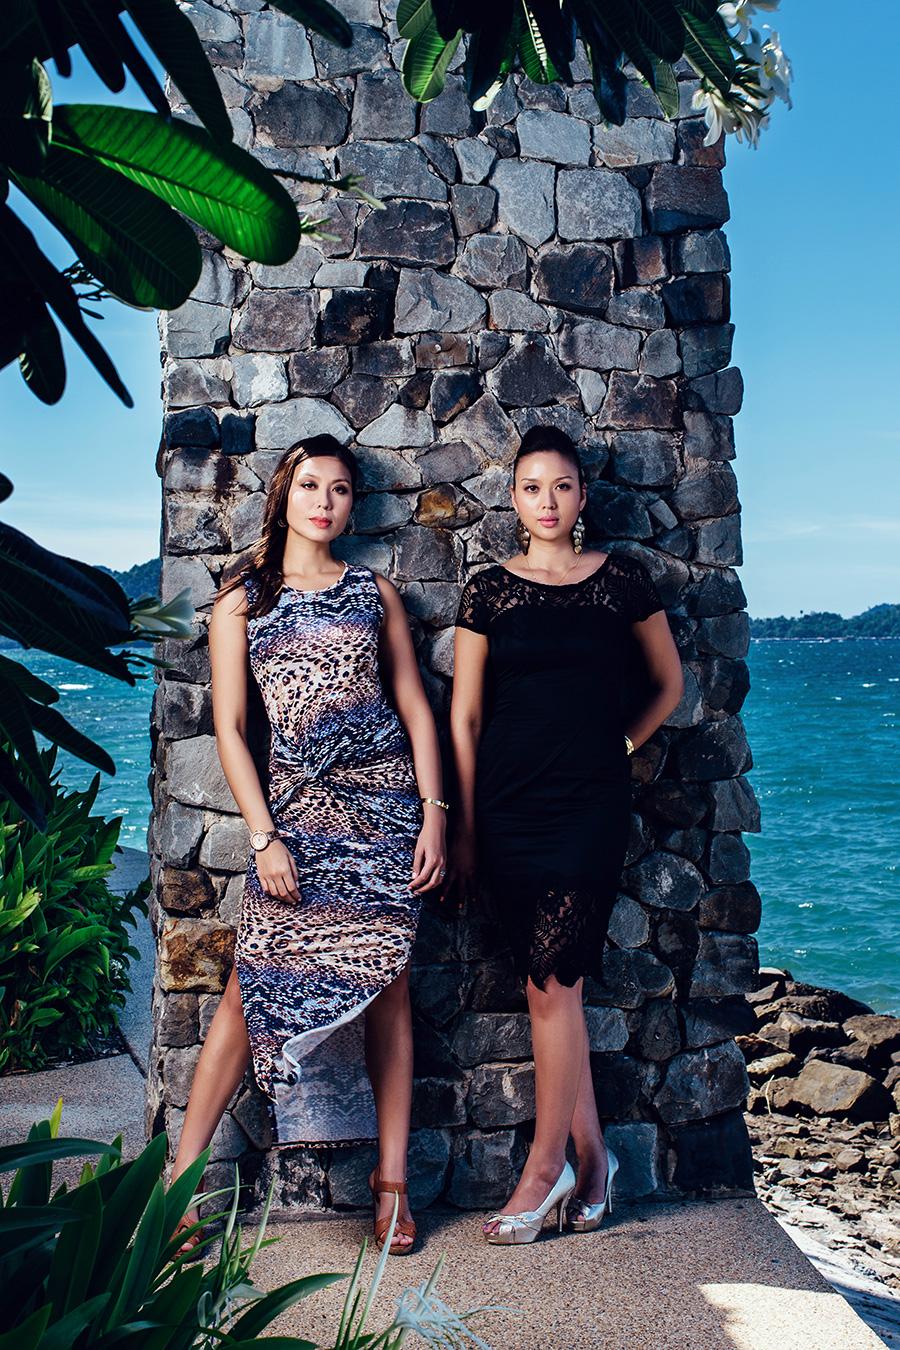 Funkydali.com - Editorial - Prestige - Malaysia - Moss Family 1.jpg